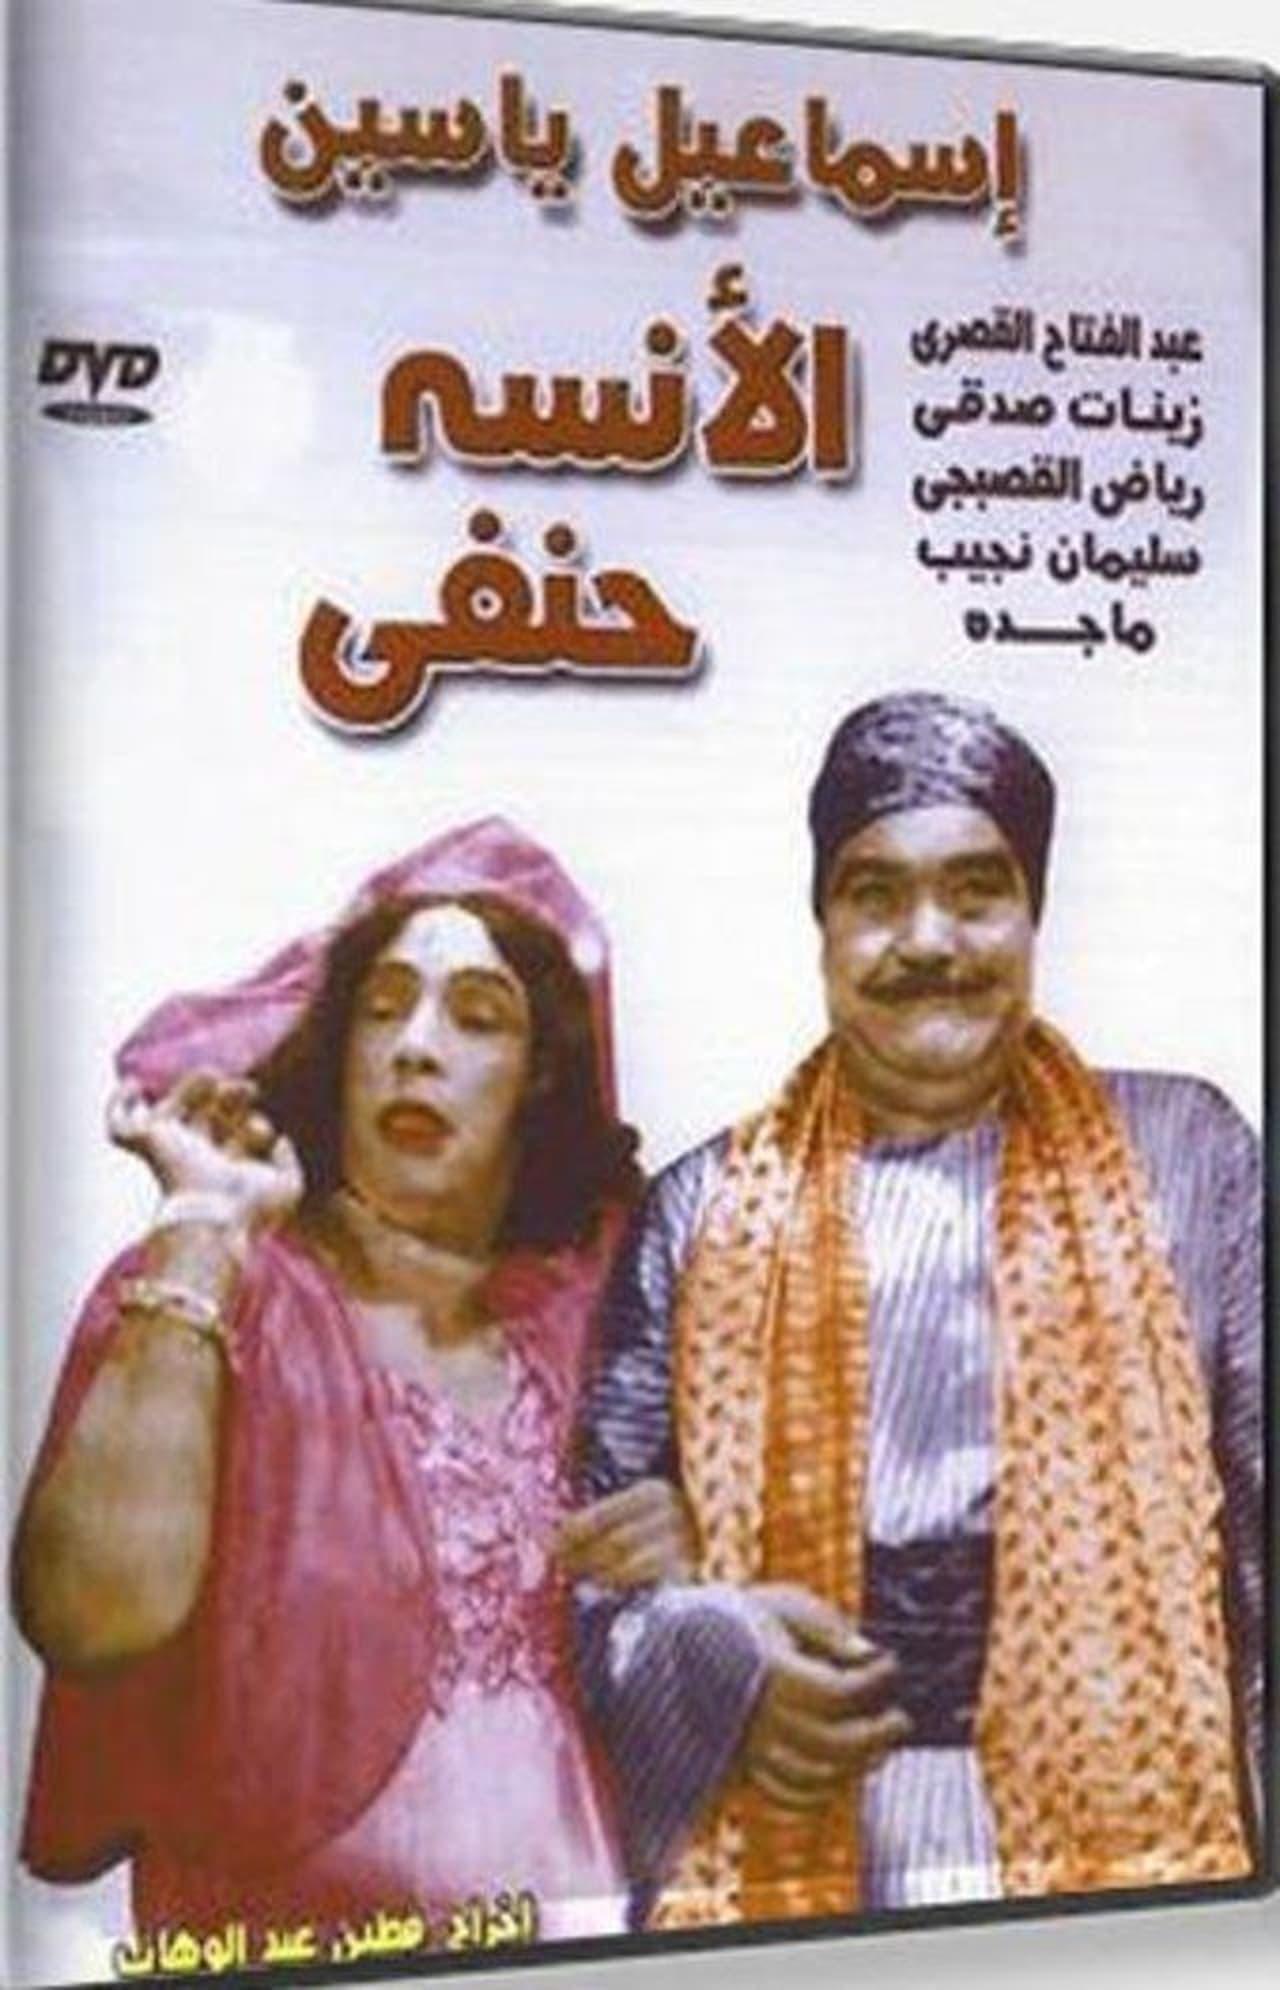 Miss Hanafi